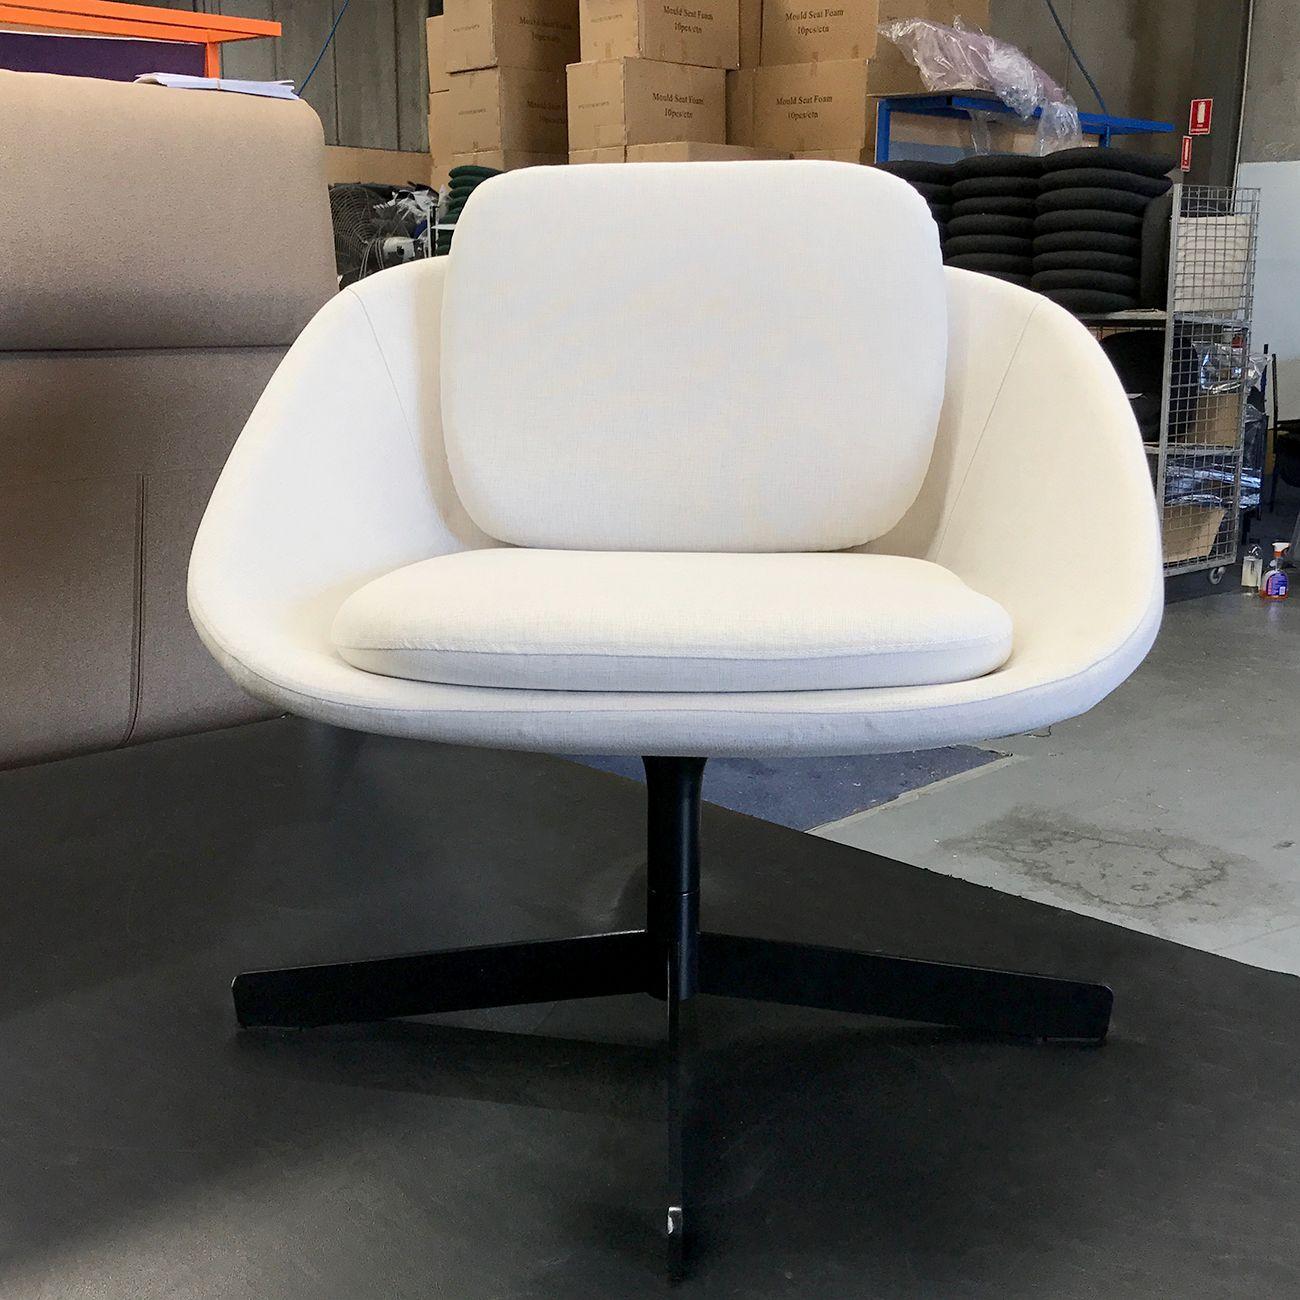 A Beautiful White Squaro With An Elegant Black Rotating Base Fineseat Furniture Furnituredes Black Office Chair Best Office Chair Office Chairs Australia